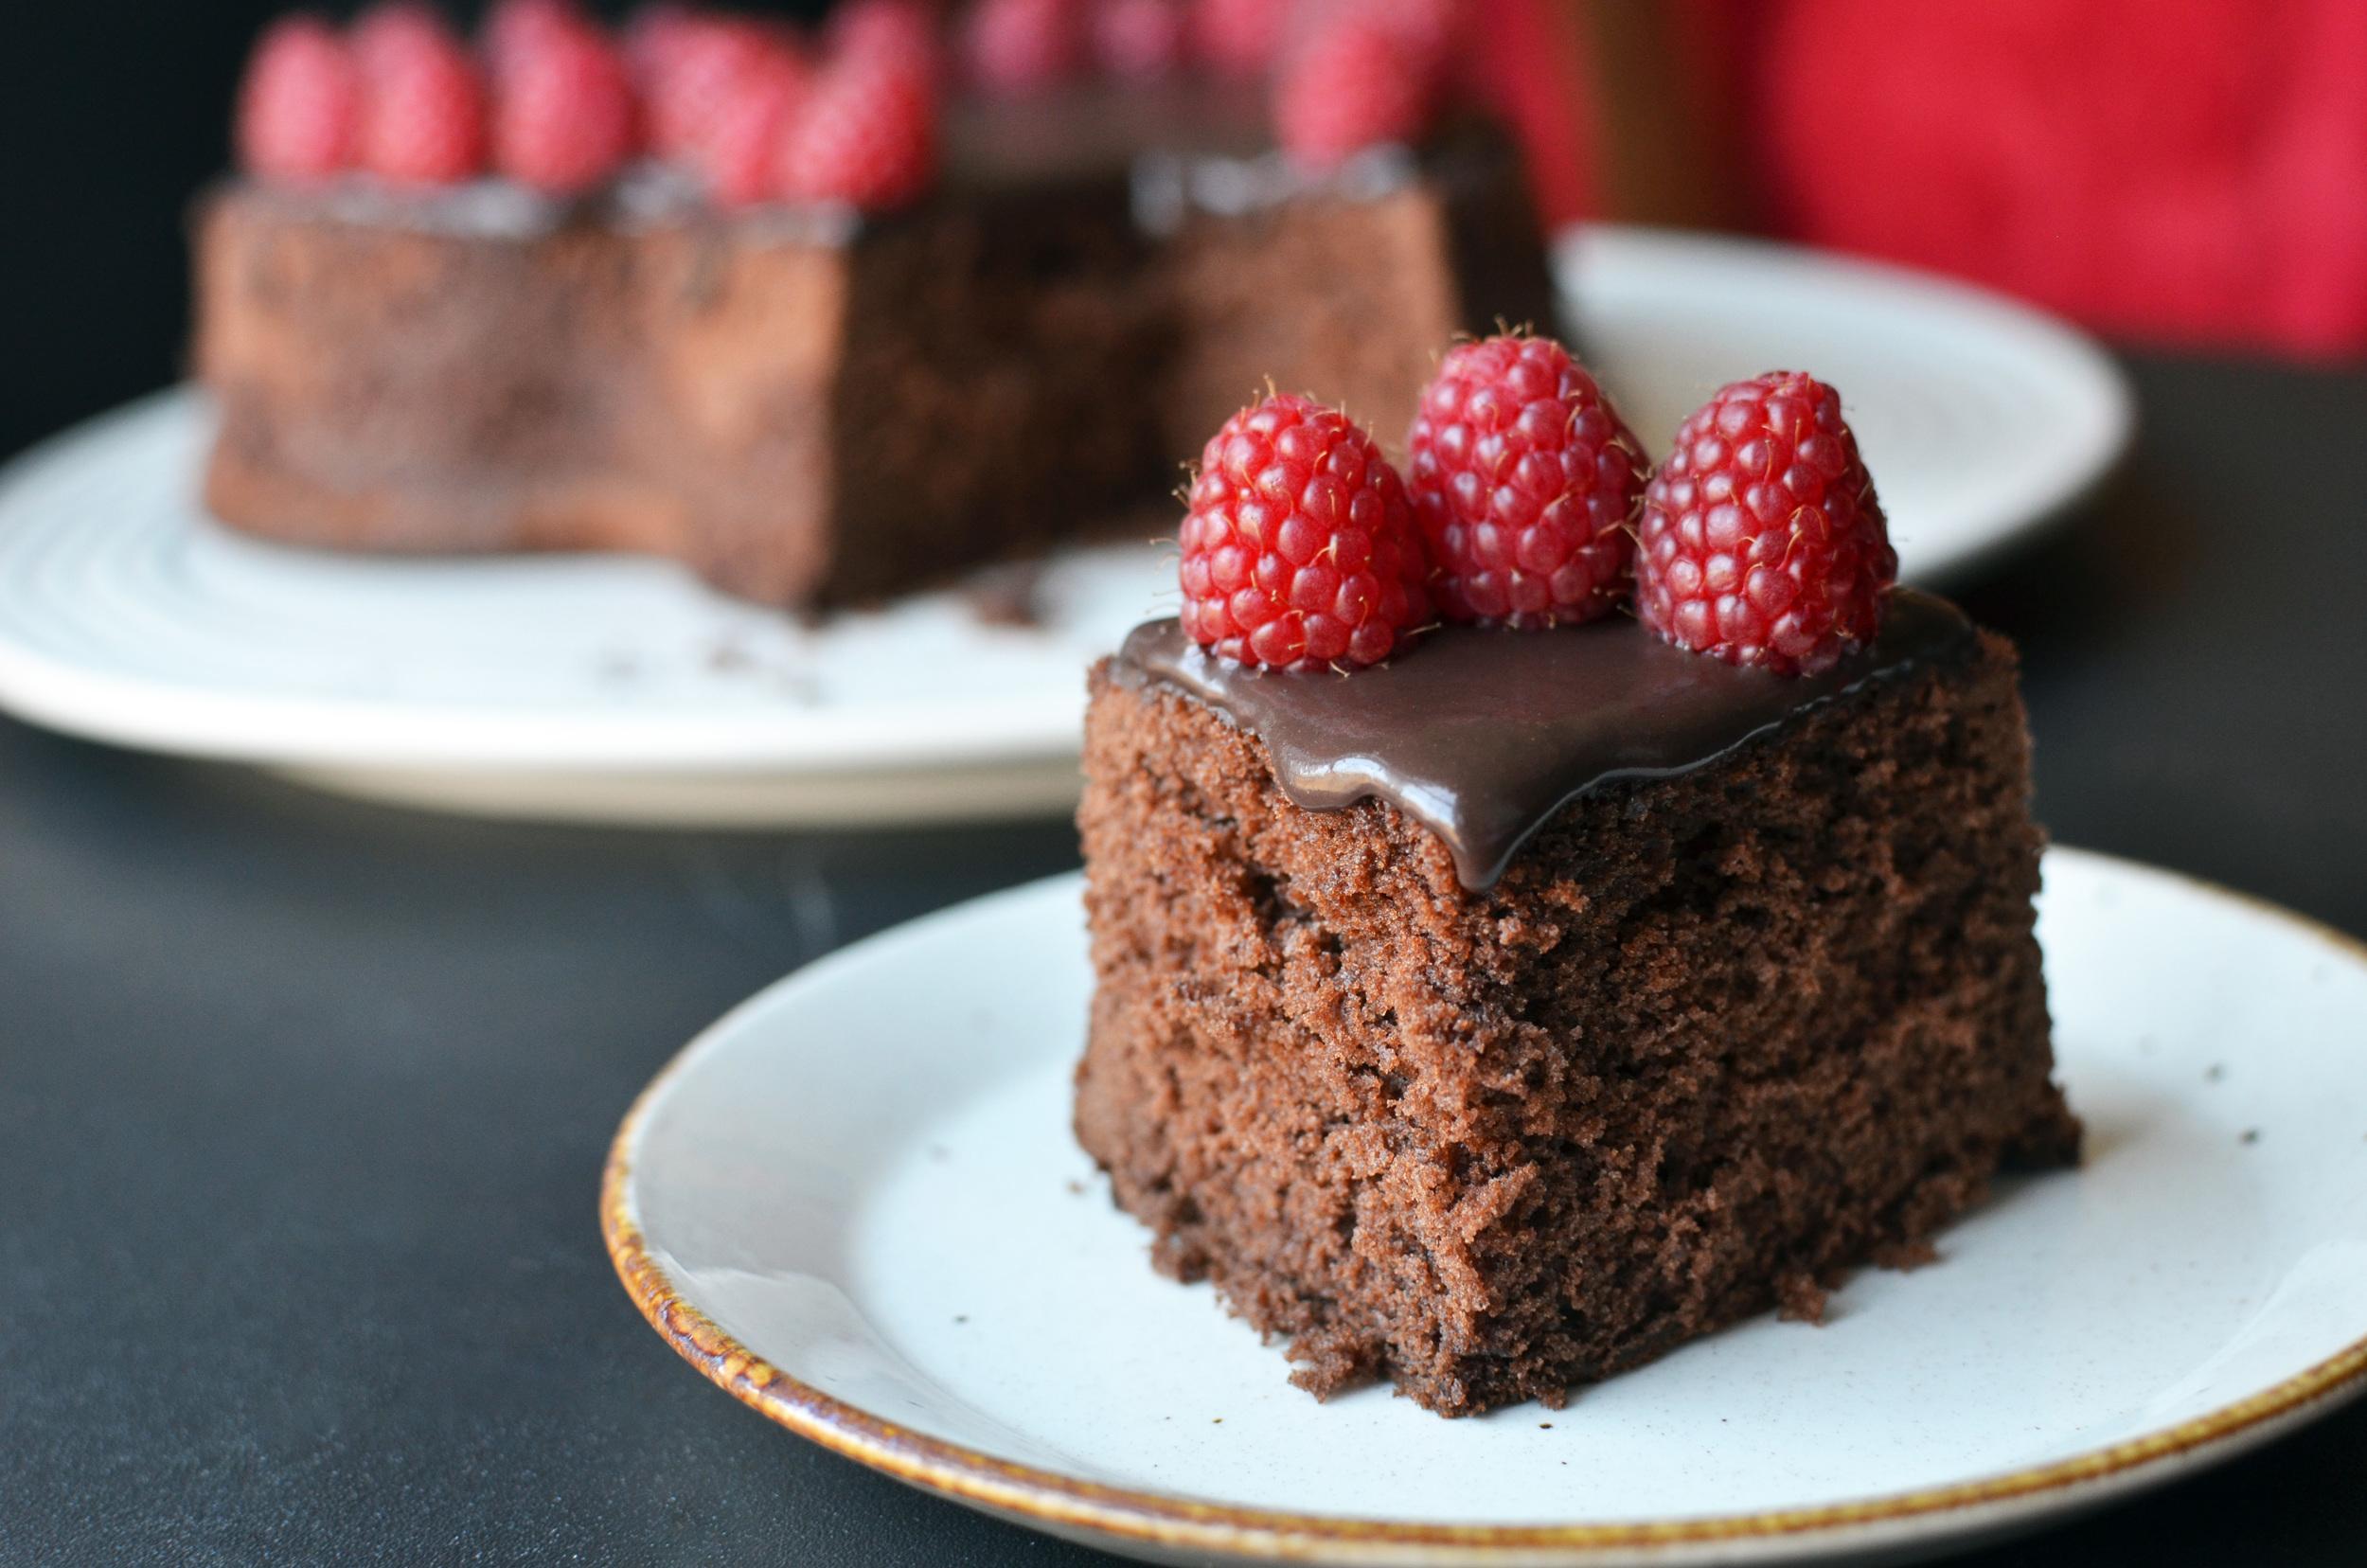 Chocolate Pavarotti - ButterYum